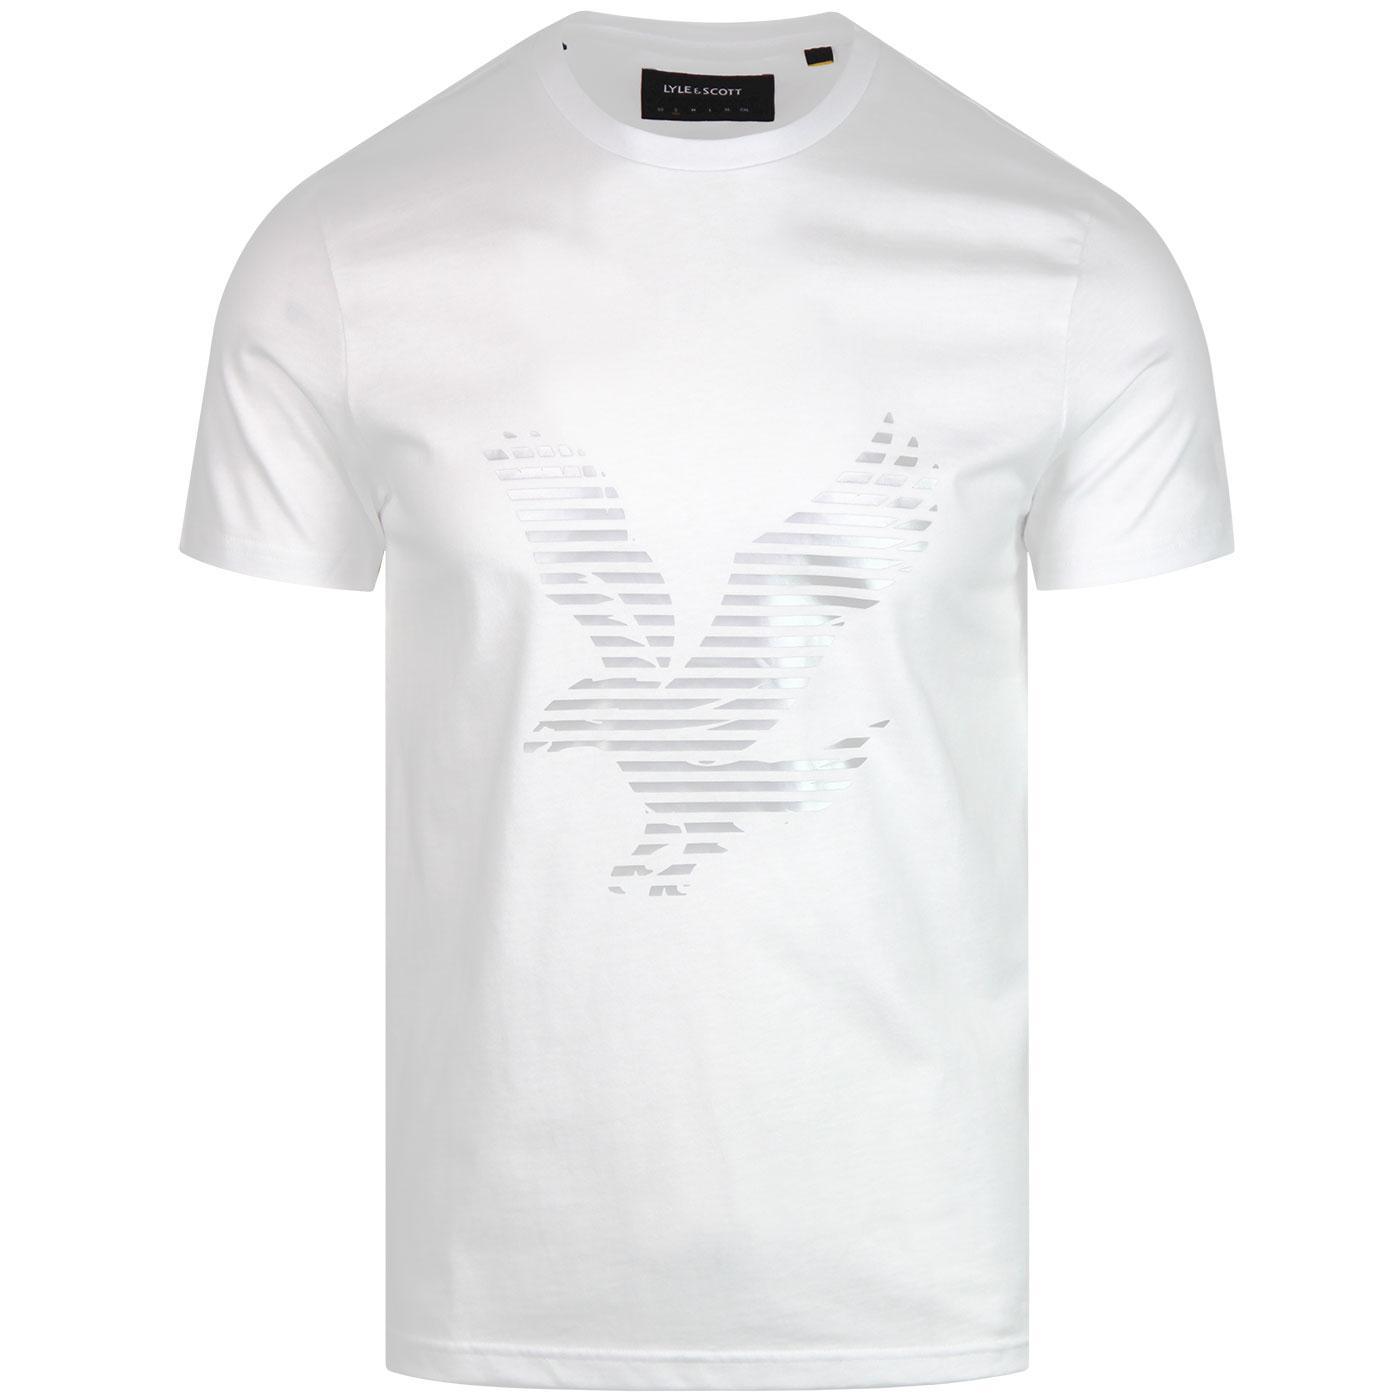 LYLE & SCOTT Retro Casuals Logo T-Shirt -  White